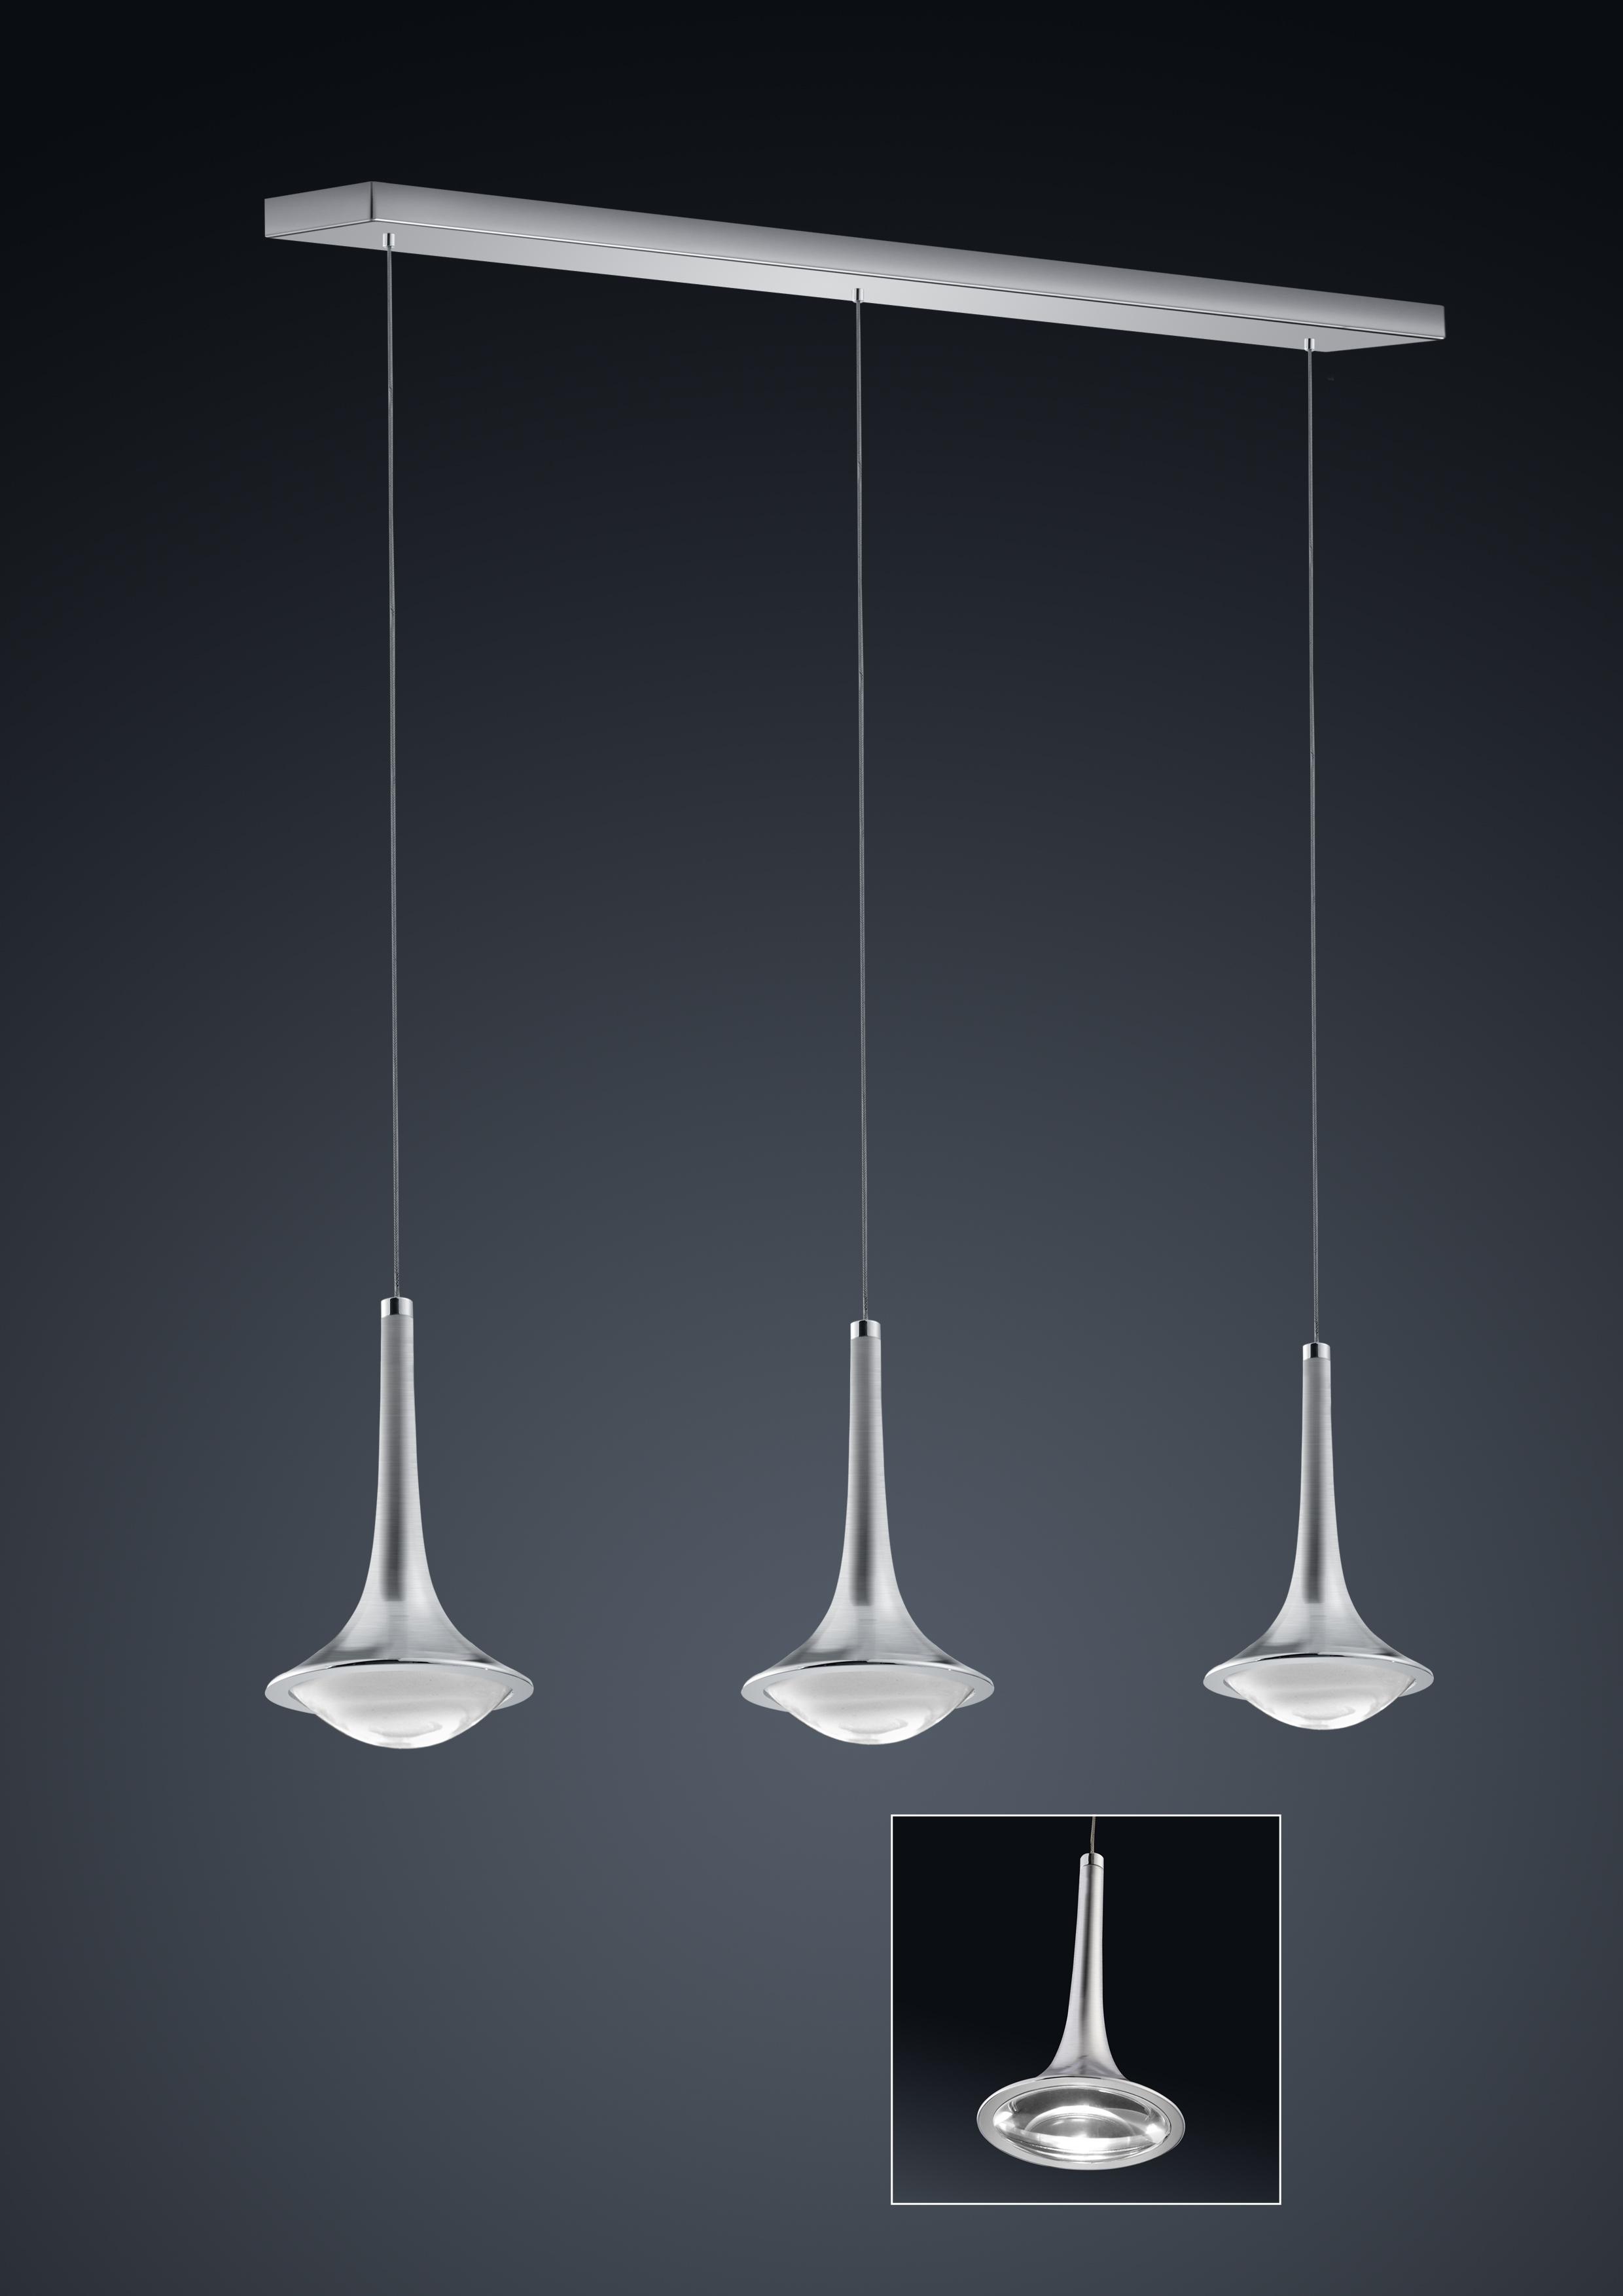 b leuchten cono pendelleuchte 20215 3 92 leuchtenking. Black Bedroom Furniture Sets. Home Design Ideas